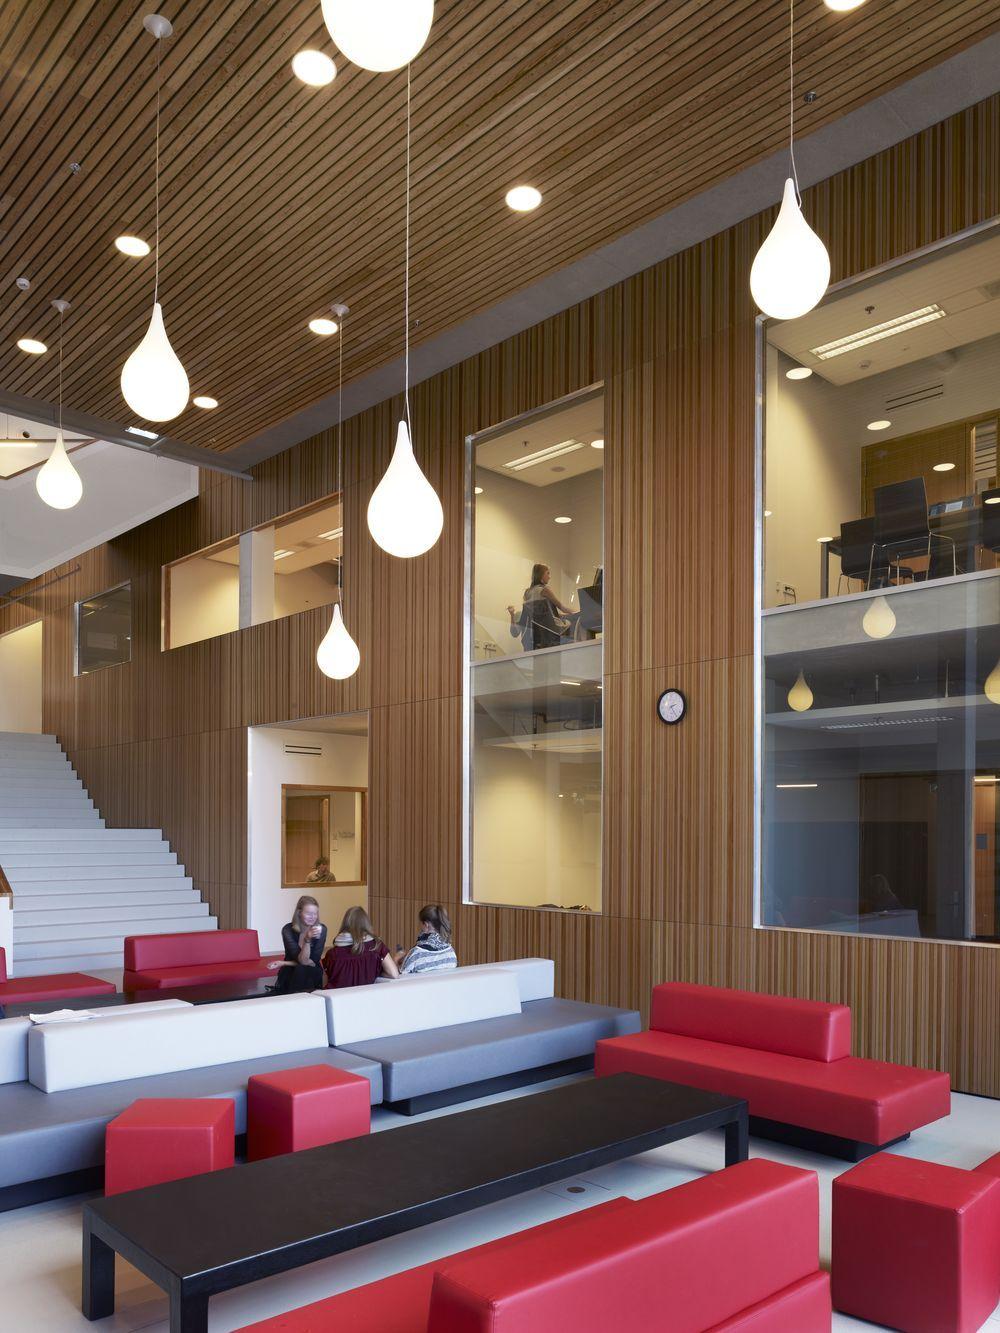 Amsterdam university college designed by mecanoo